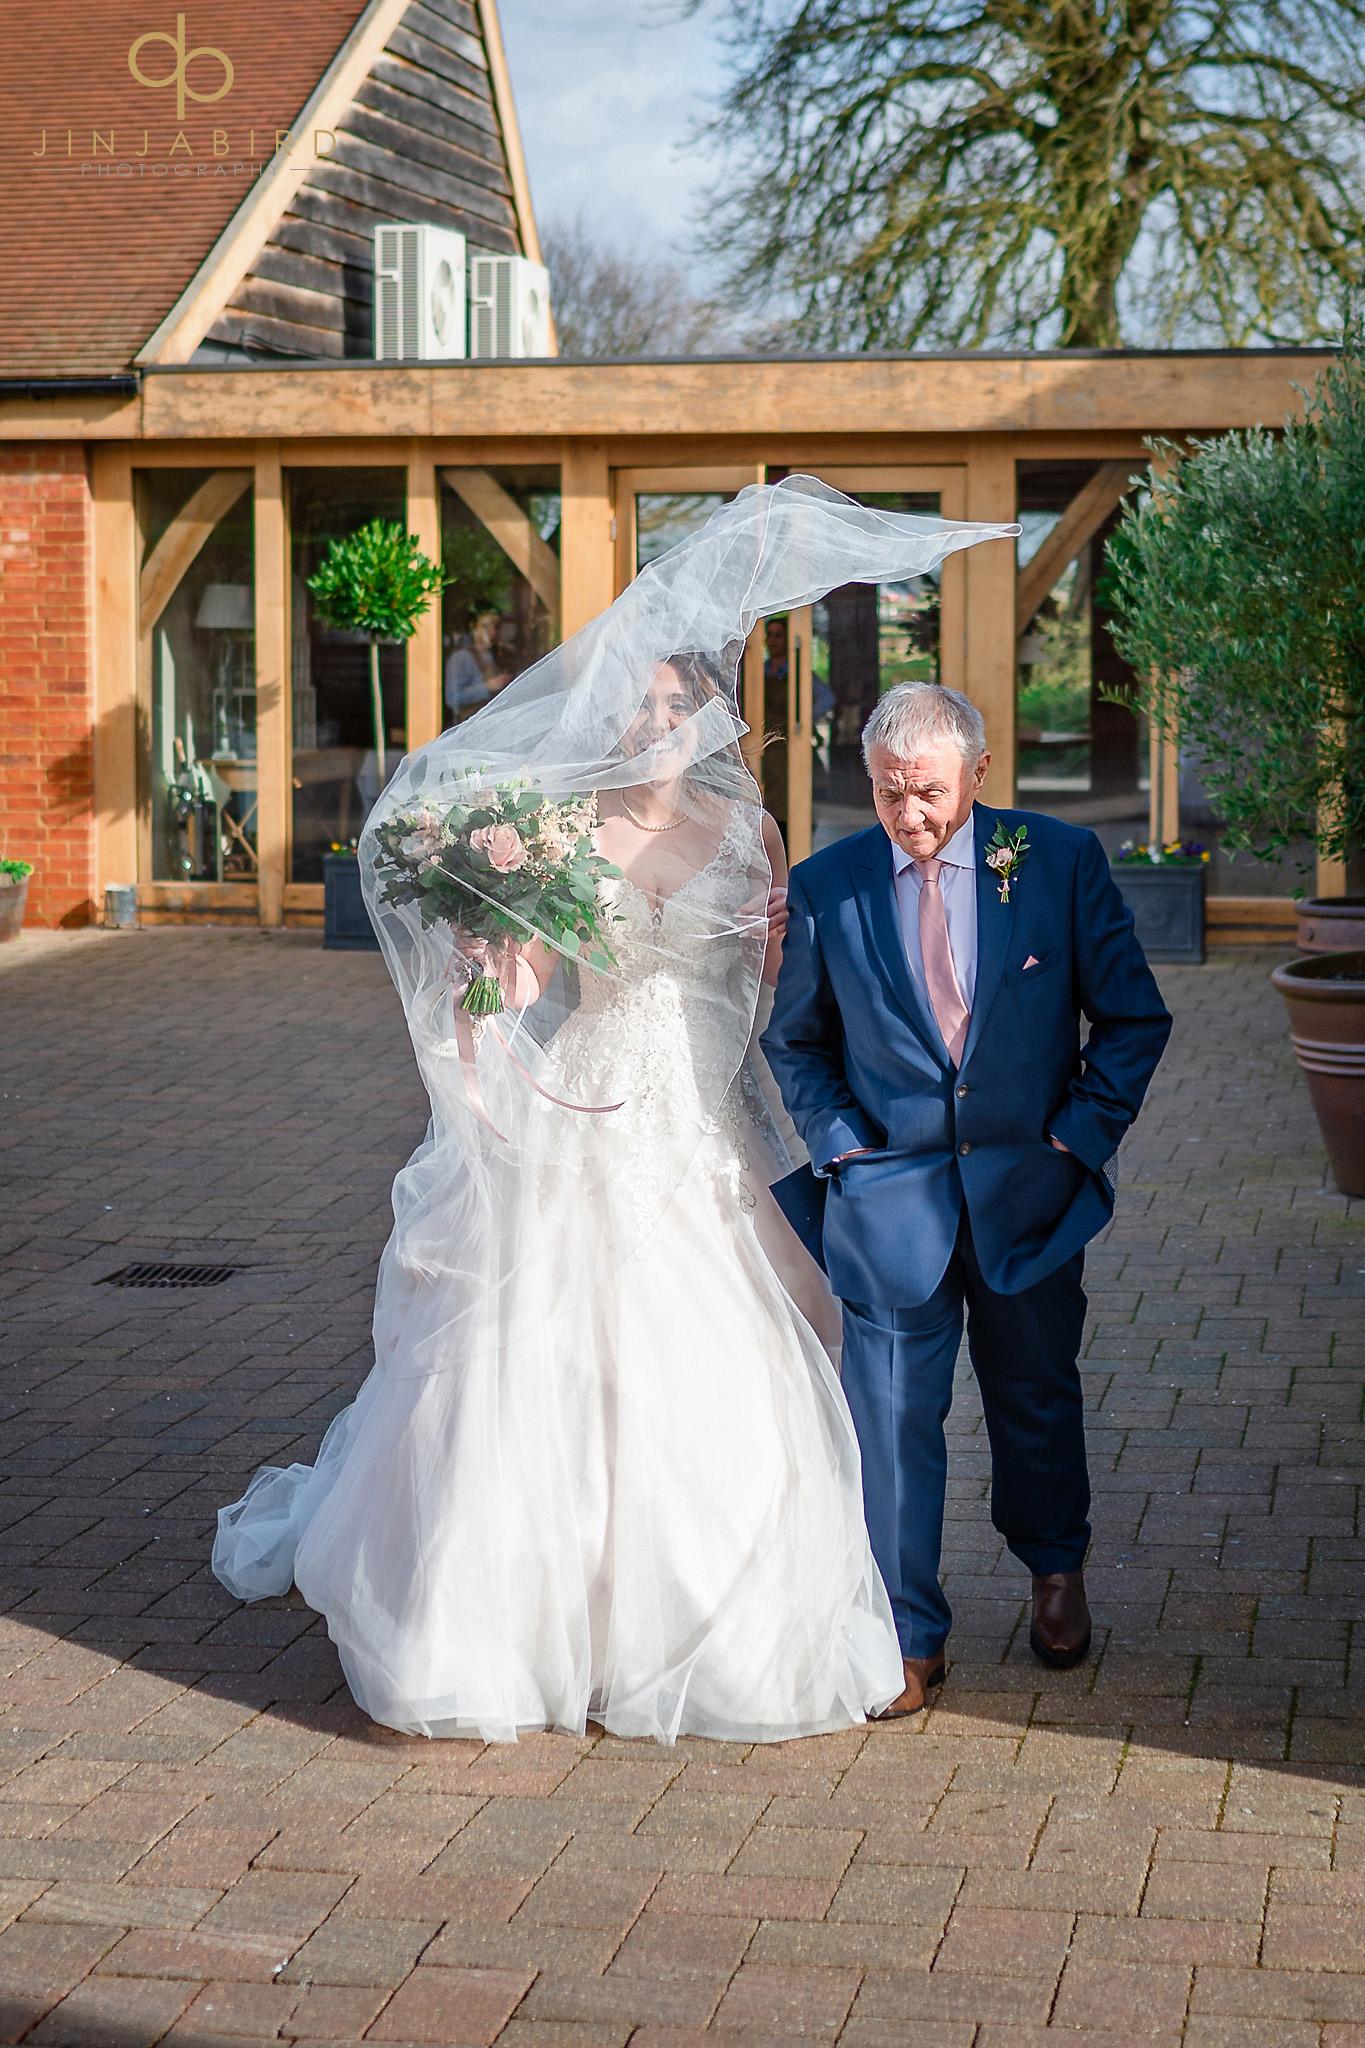 brides veil blowing in wind bassmead manor